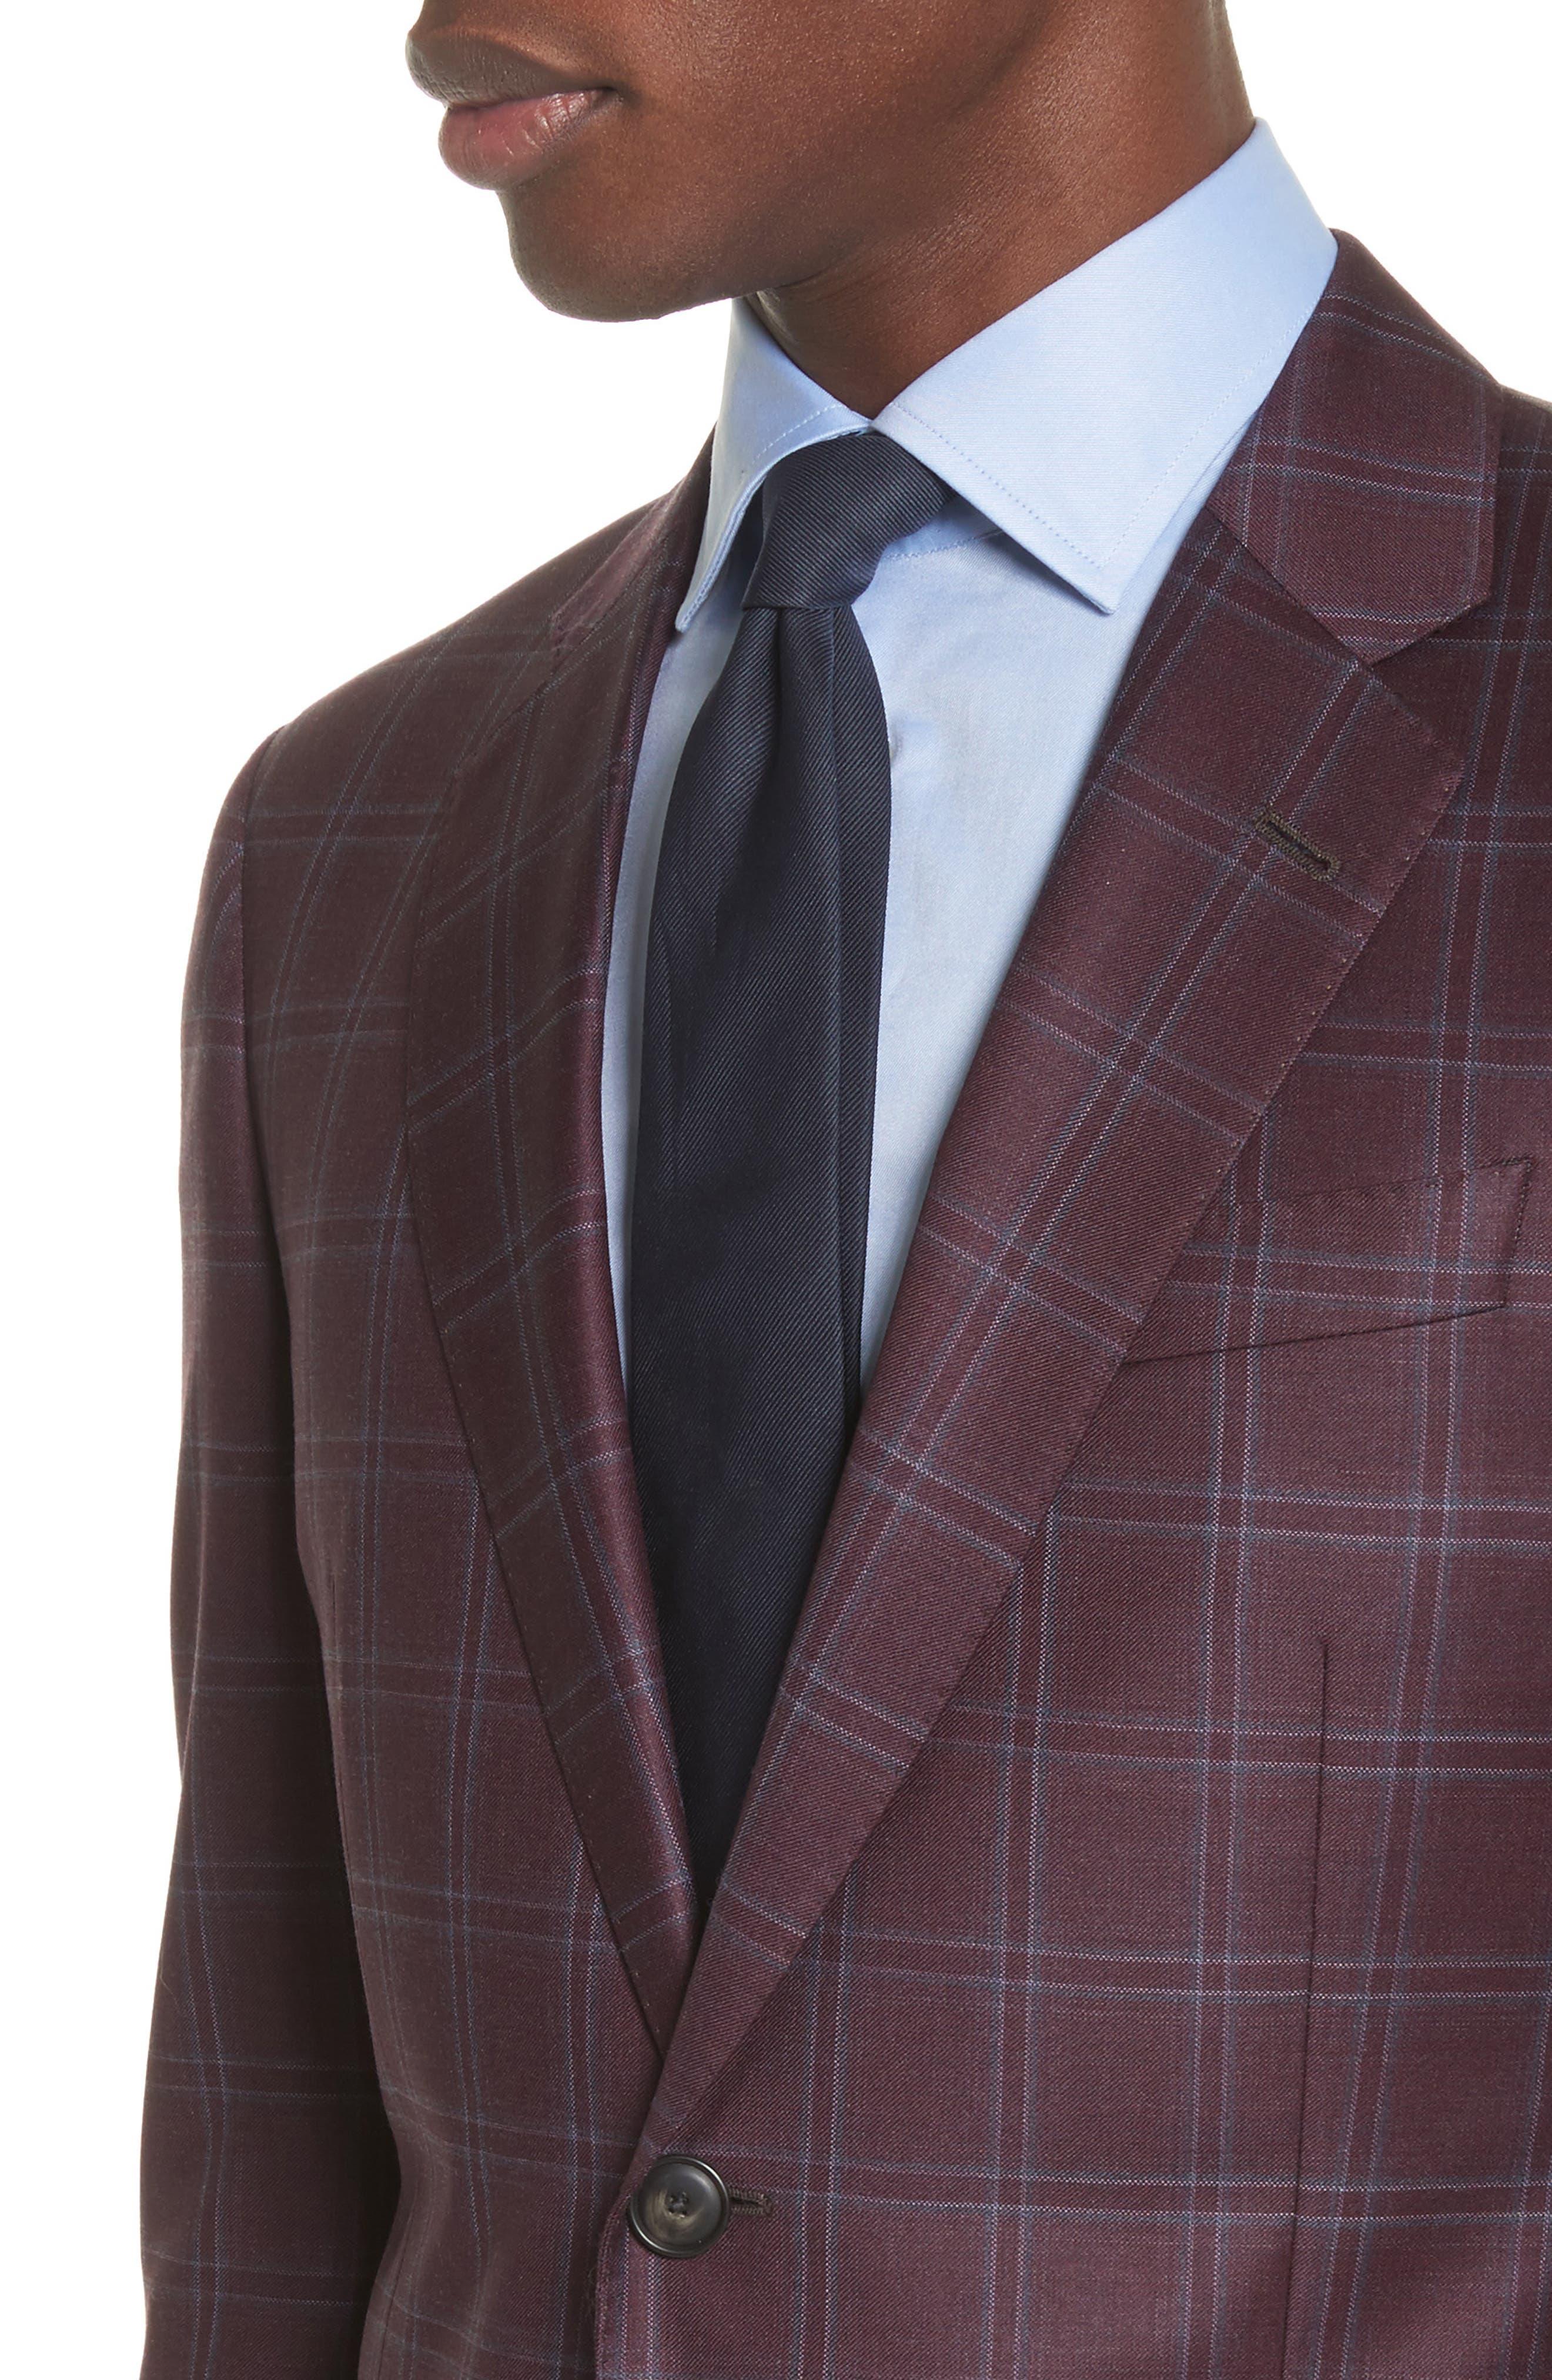 G Line Trim Fit Windowpane Wool Sport Coat,                             Alternate thumbnail 4, color,                             604